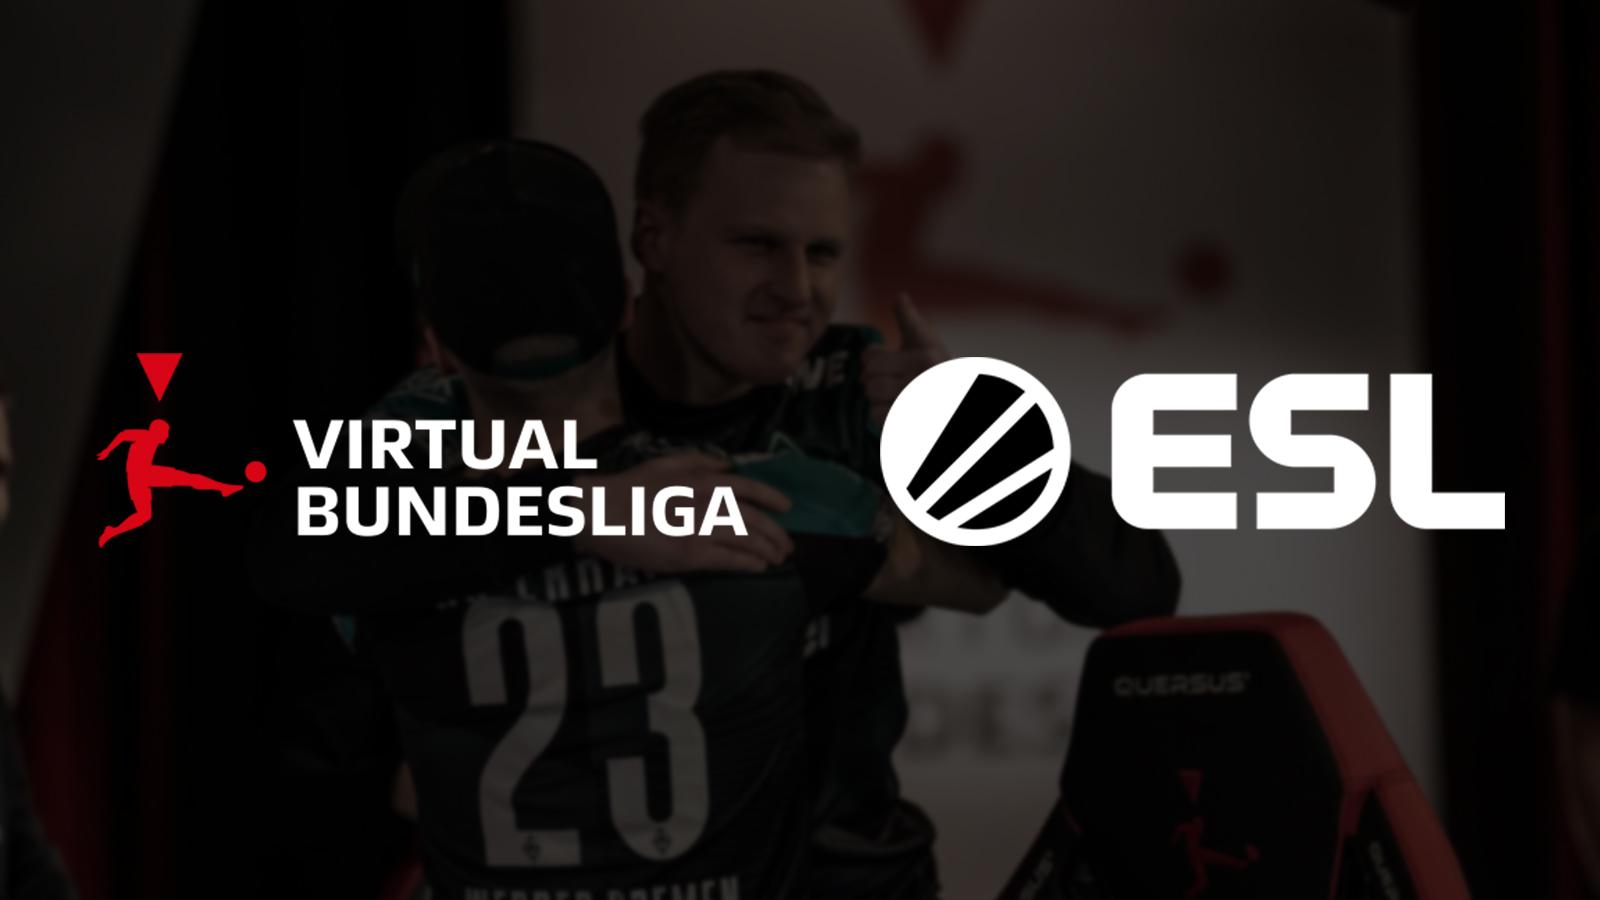 Virtual Bundesliga ESL Partnership